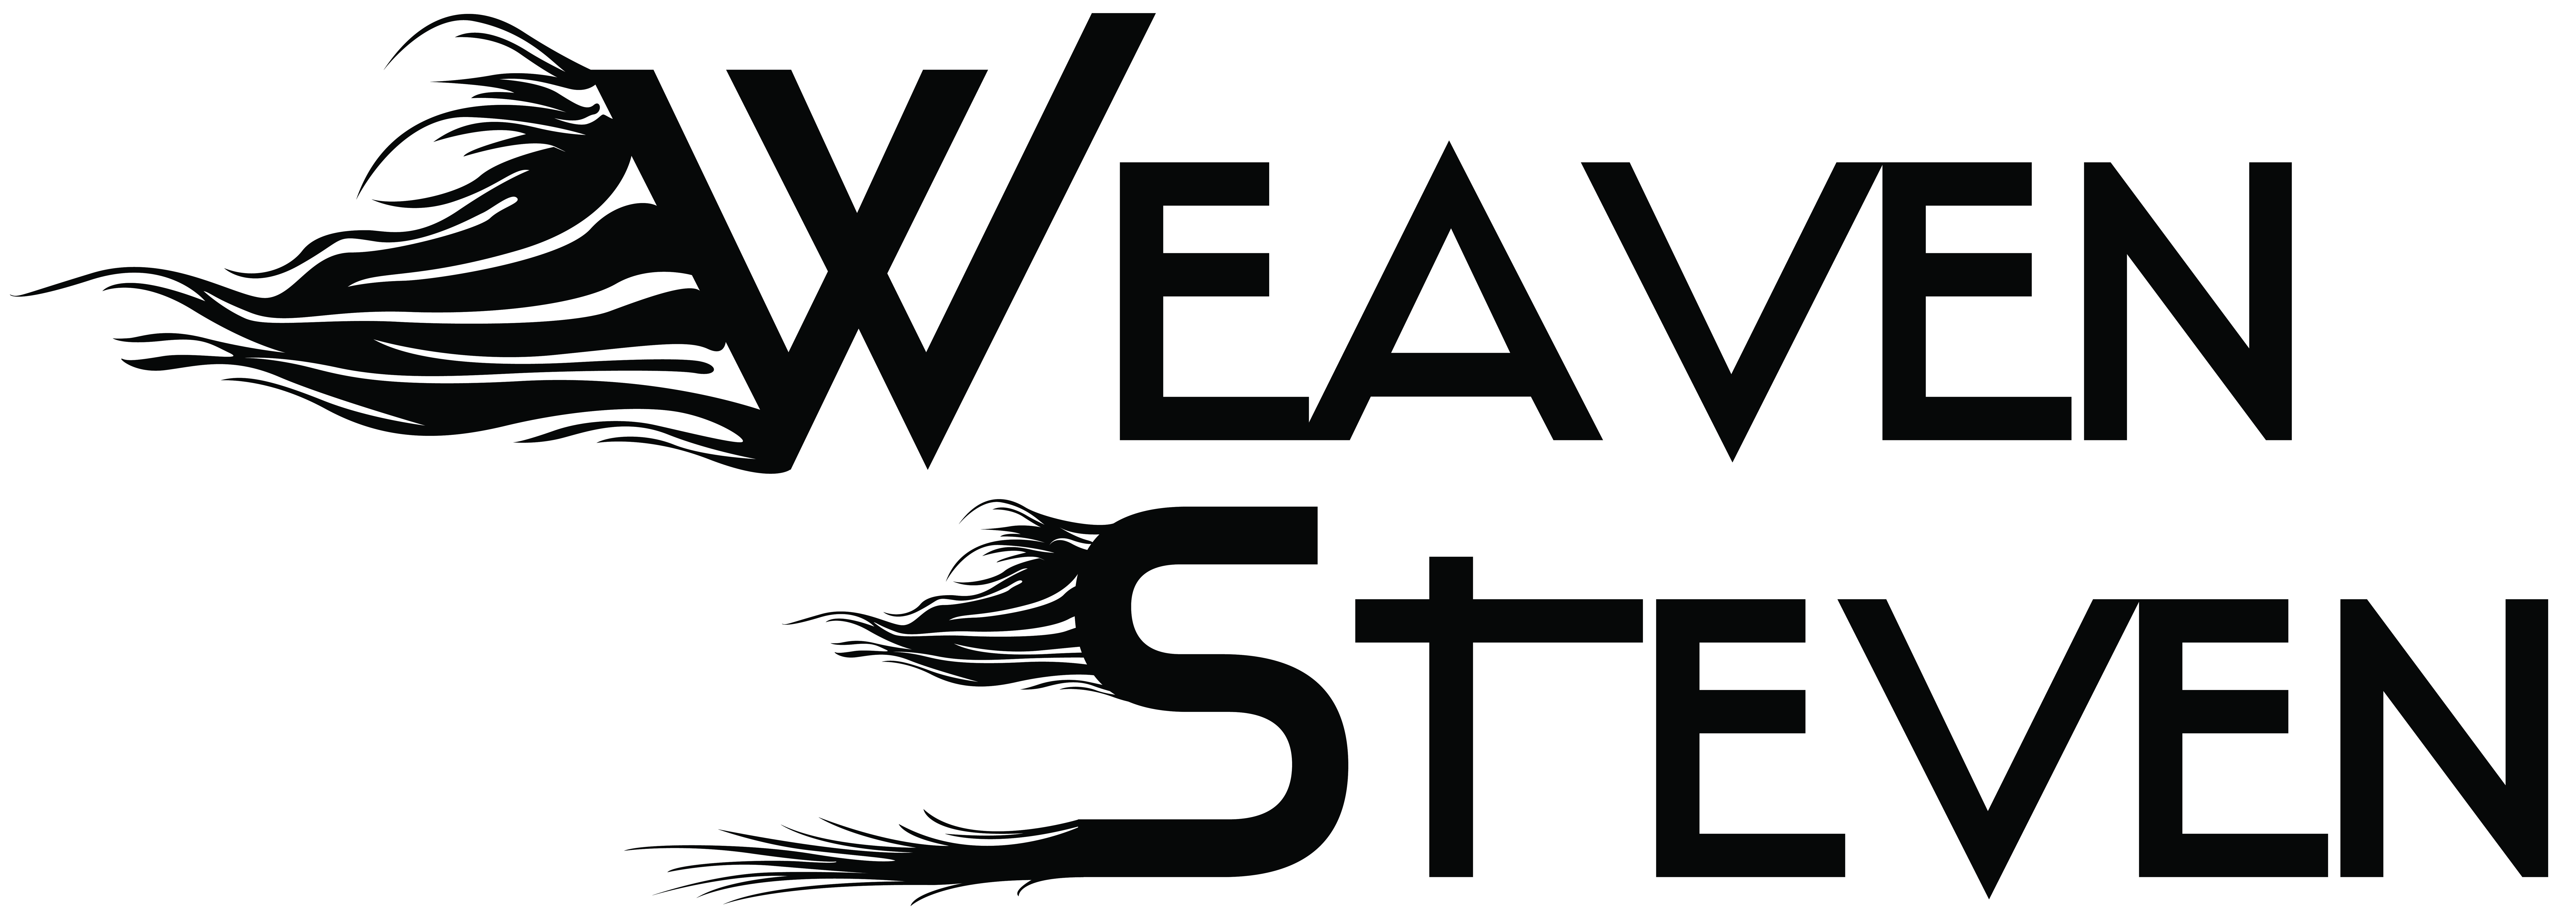 Weaven Steven Signature